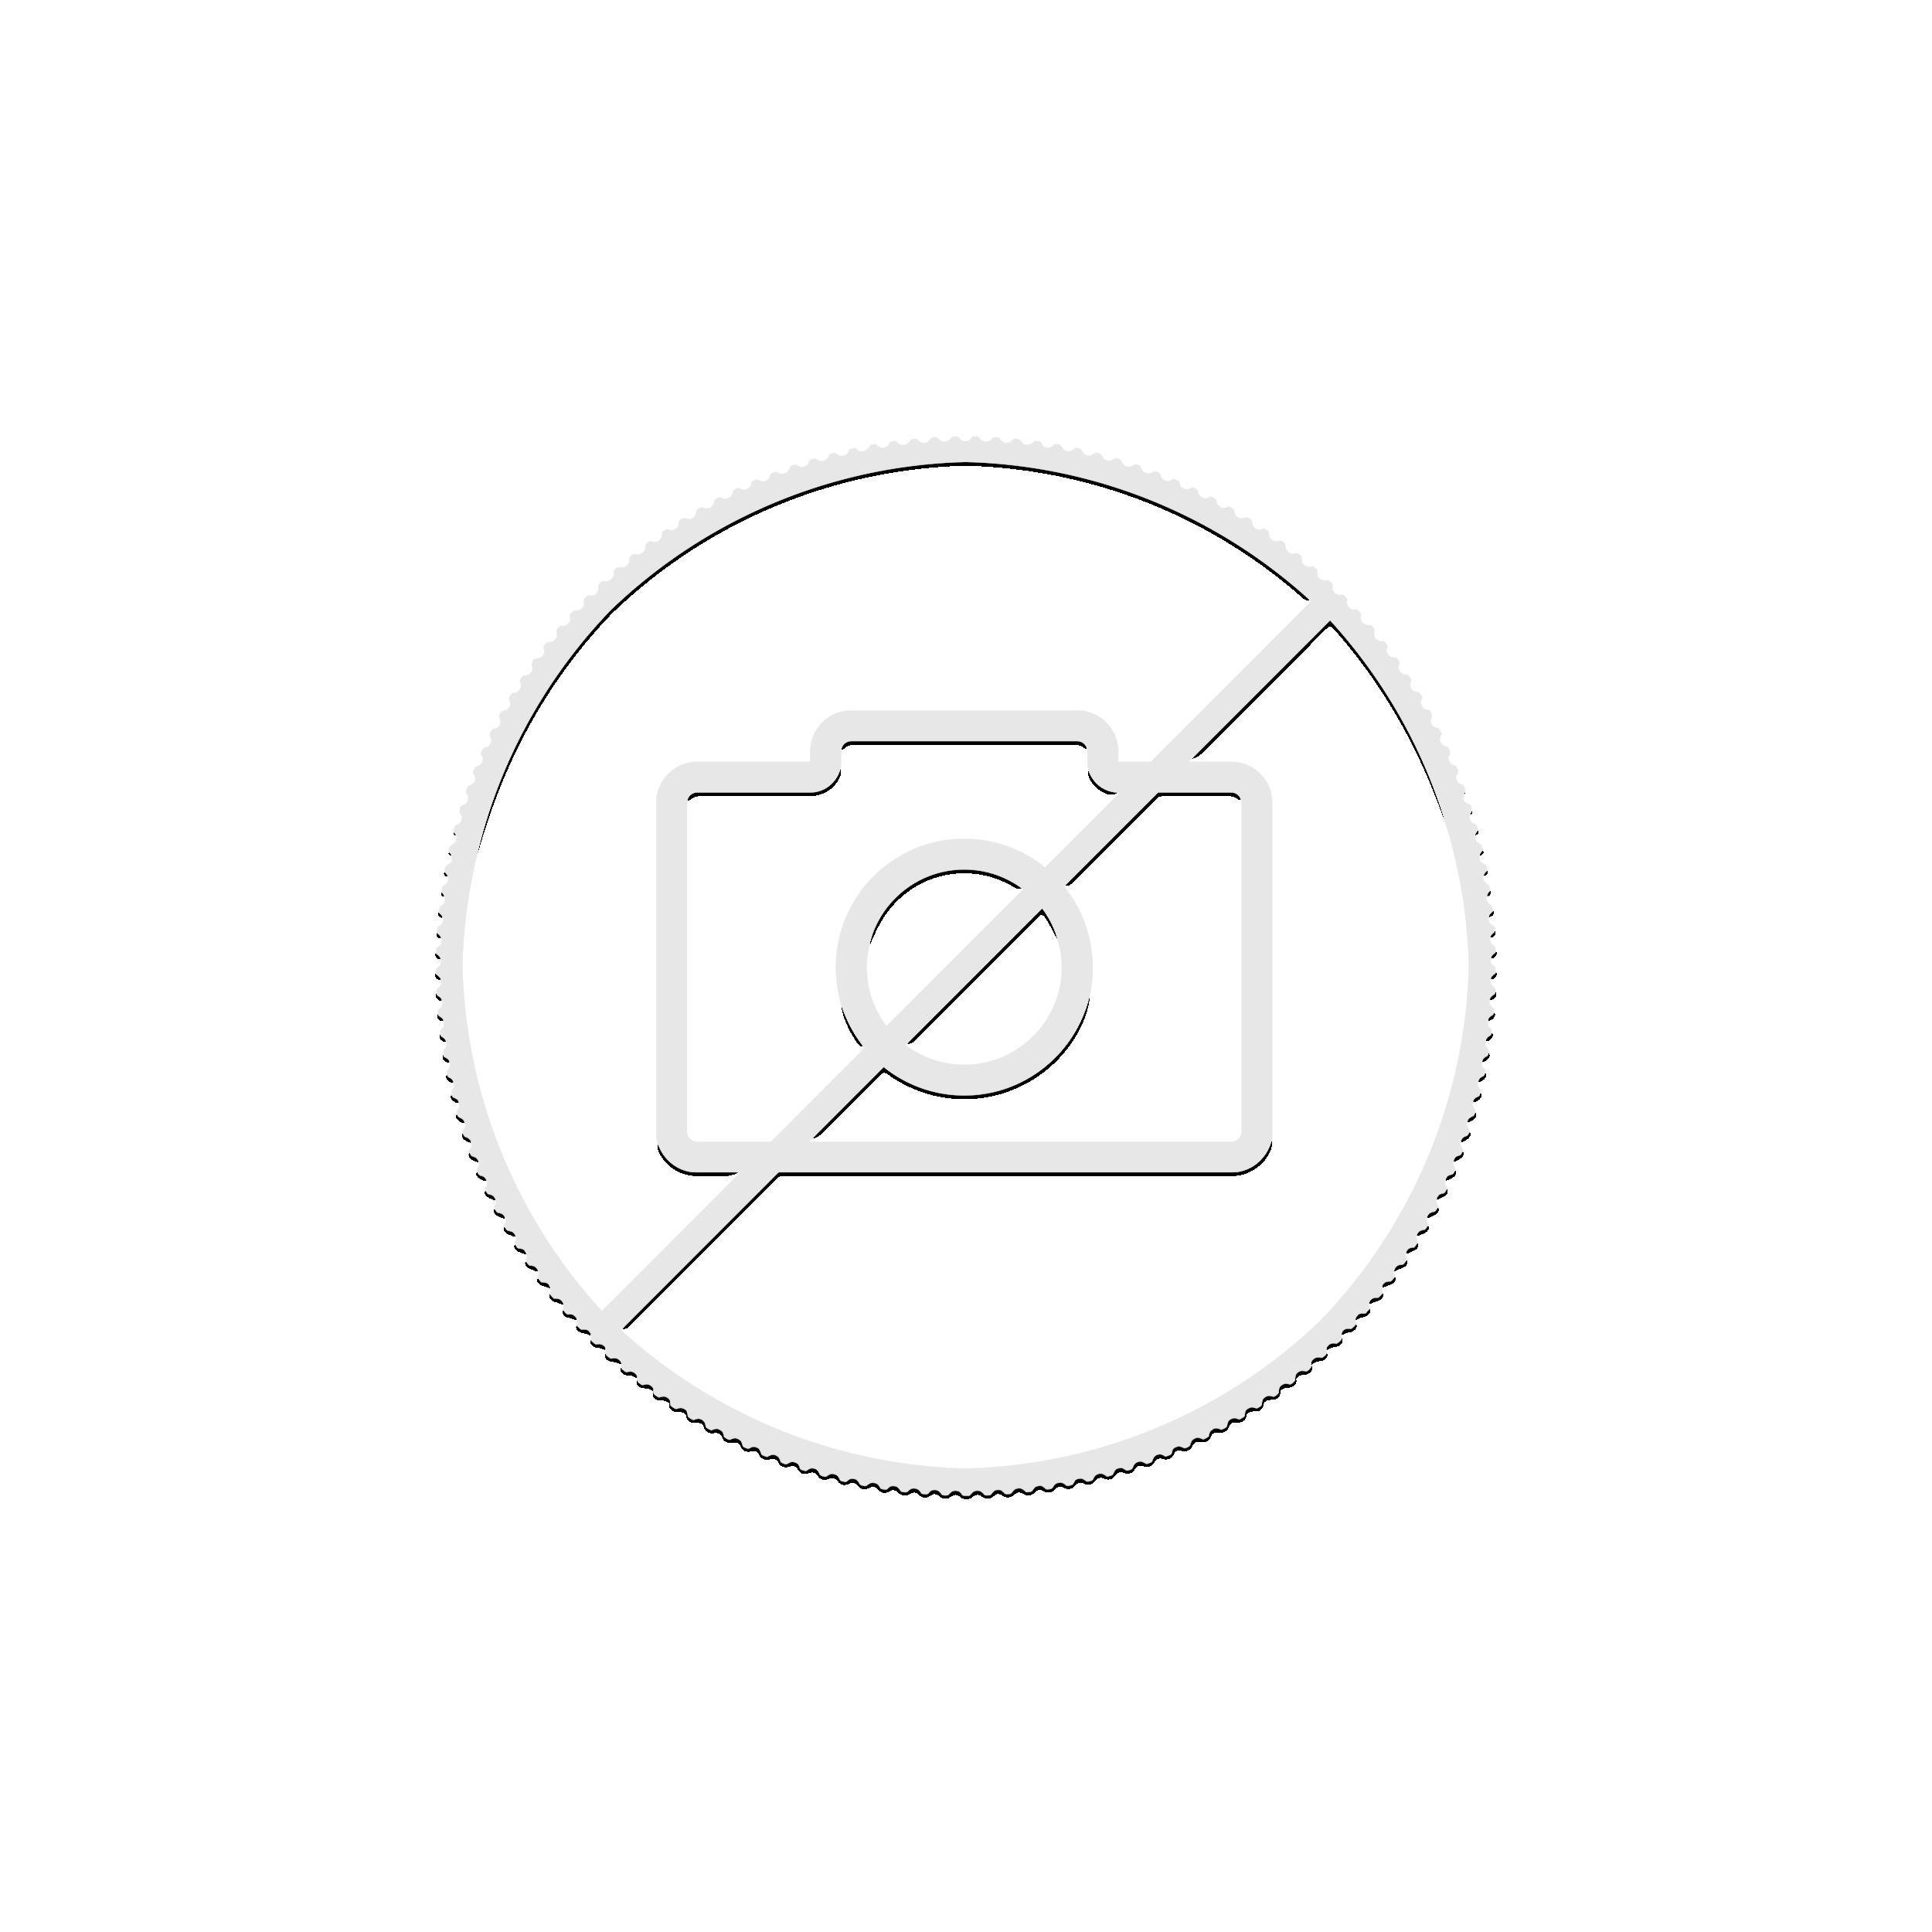 2 troy ounce zilveren munt Azure Dragon 2020